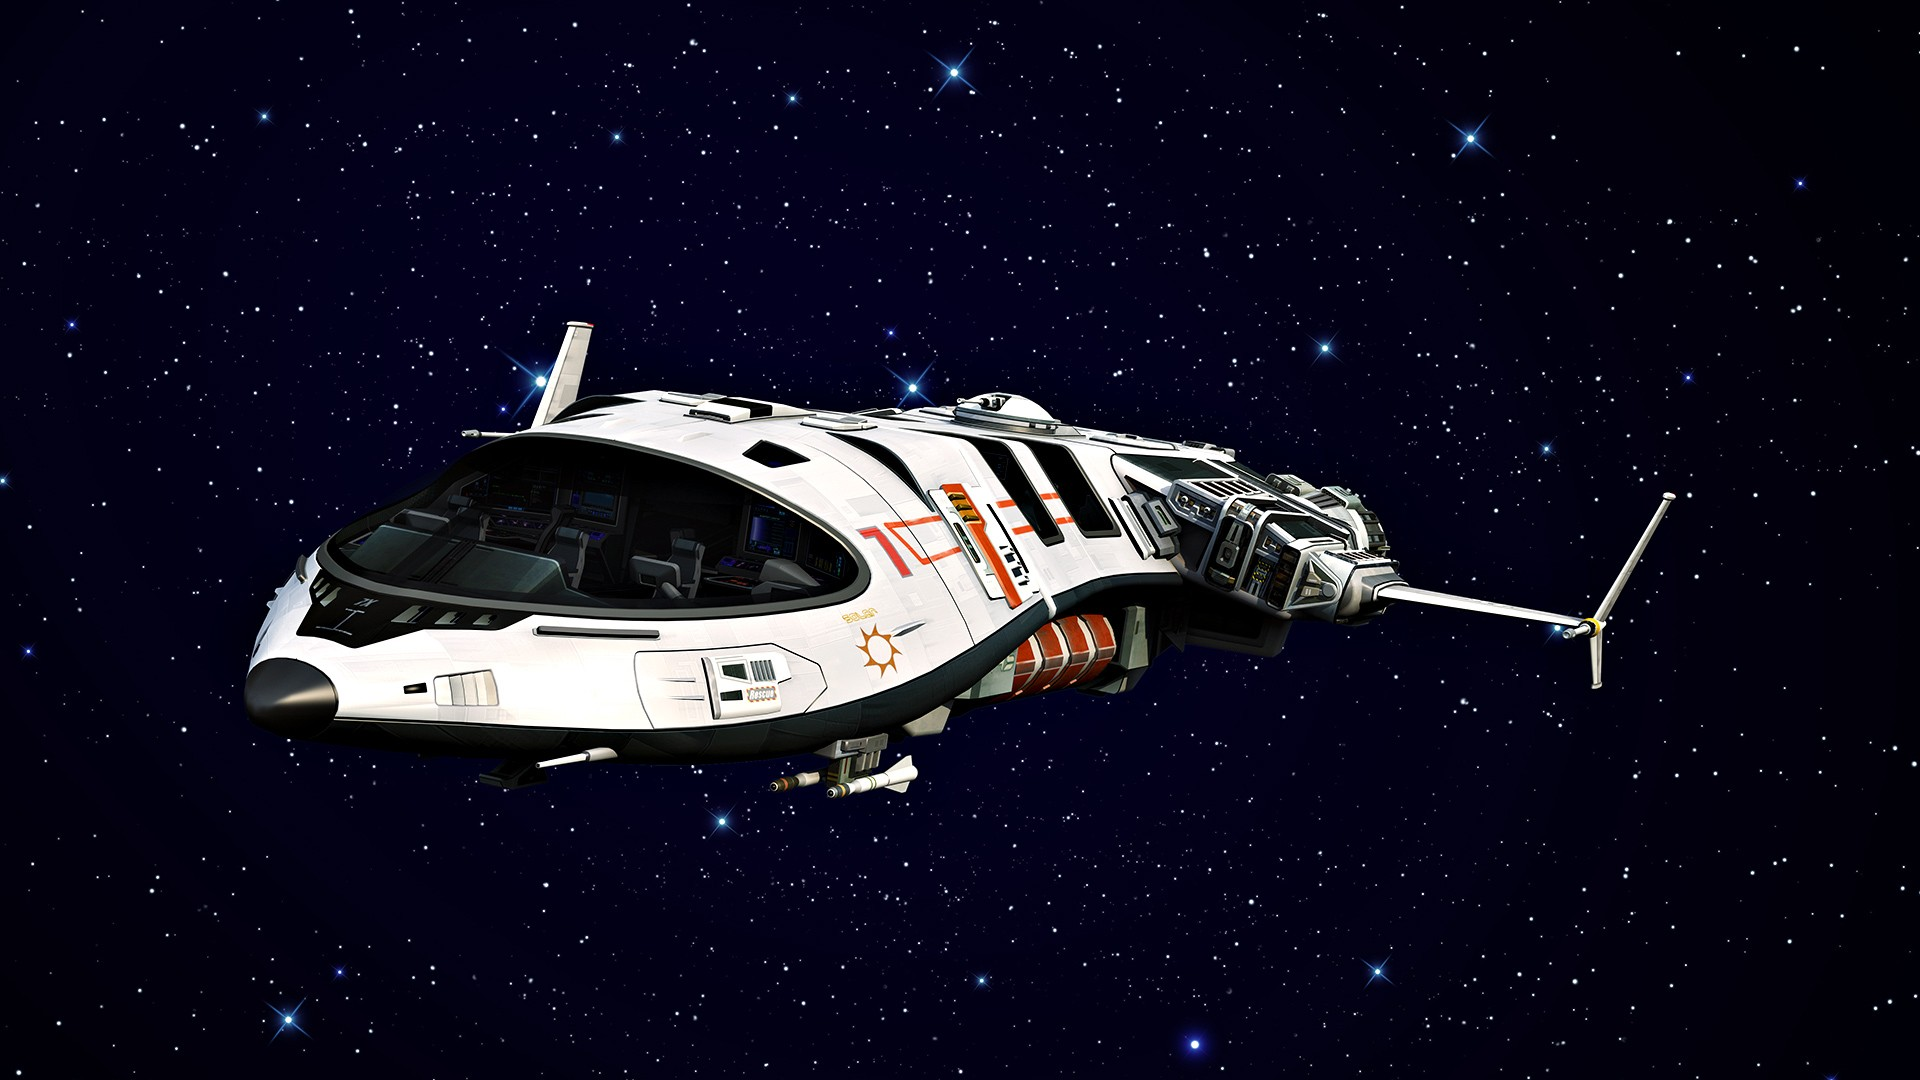 Spaceships wallpaper wallpapersafari - Spaceship wallpaper ...